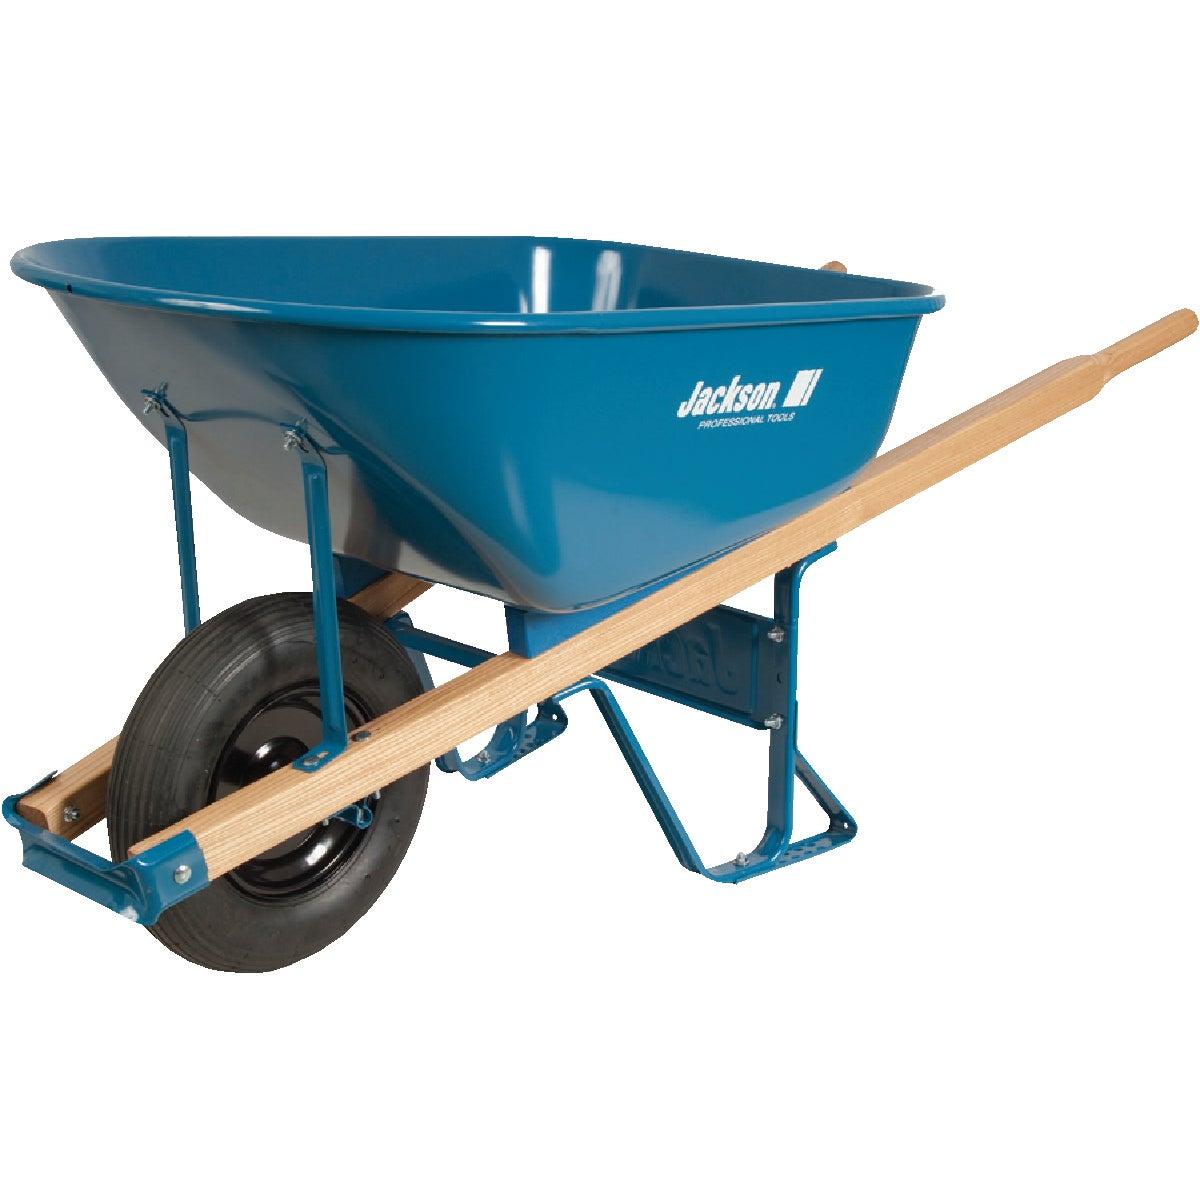 Jackson Professional Steel Wheelbarrow, M6T22